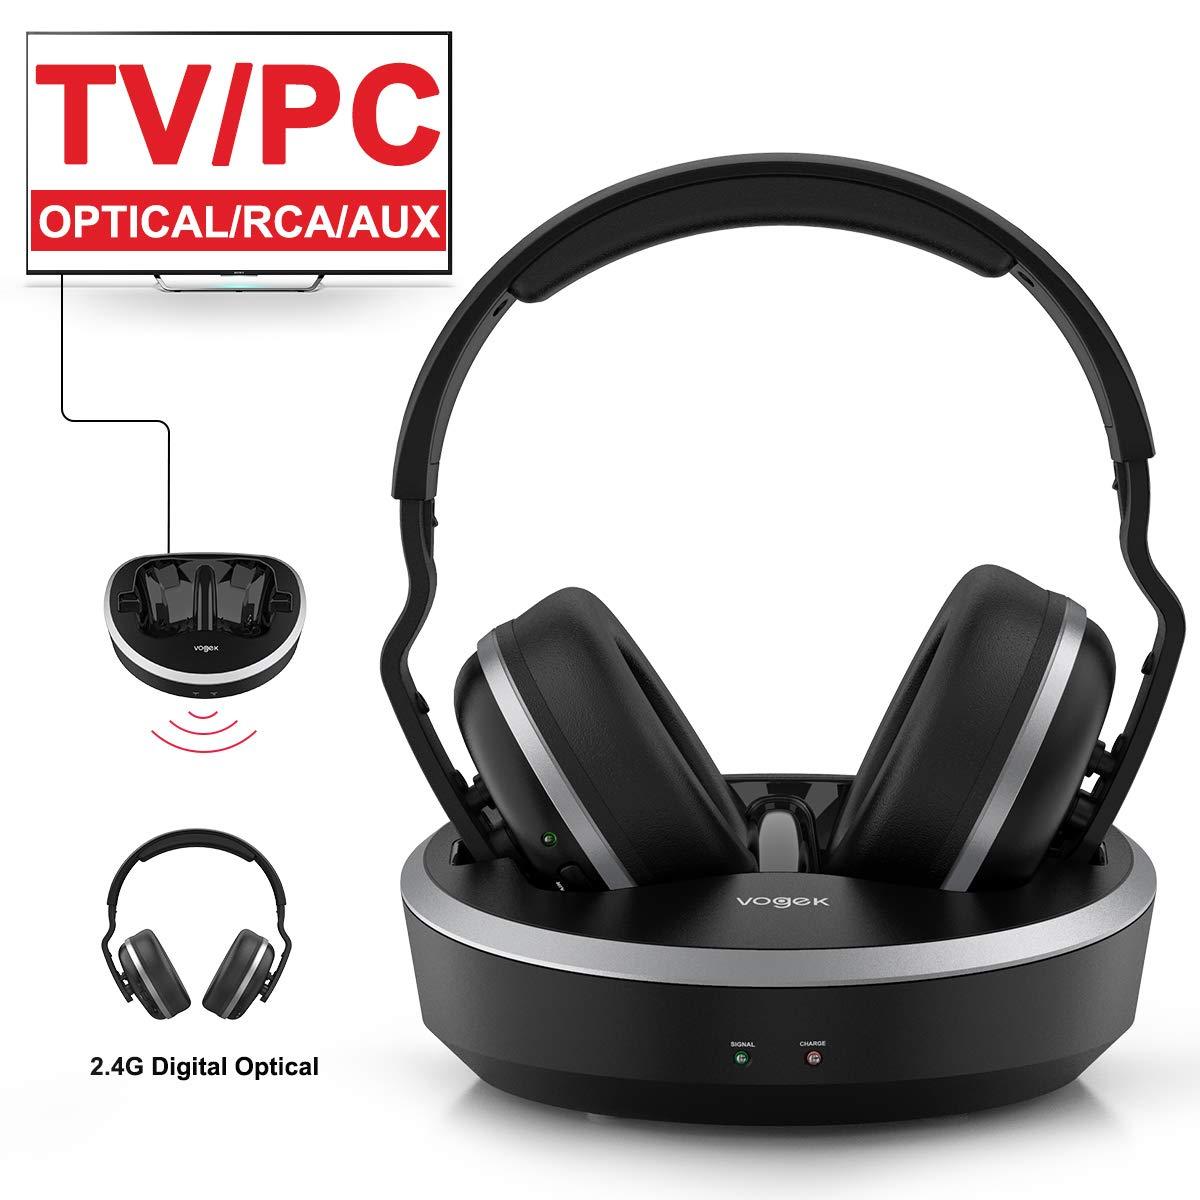 Headphone VOGEK Transmitter Rechargeable Bluetooth